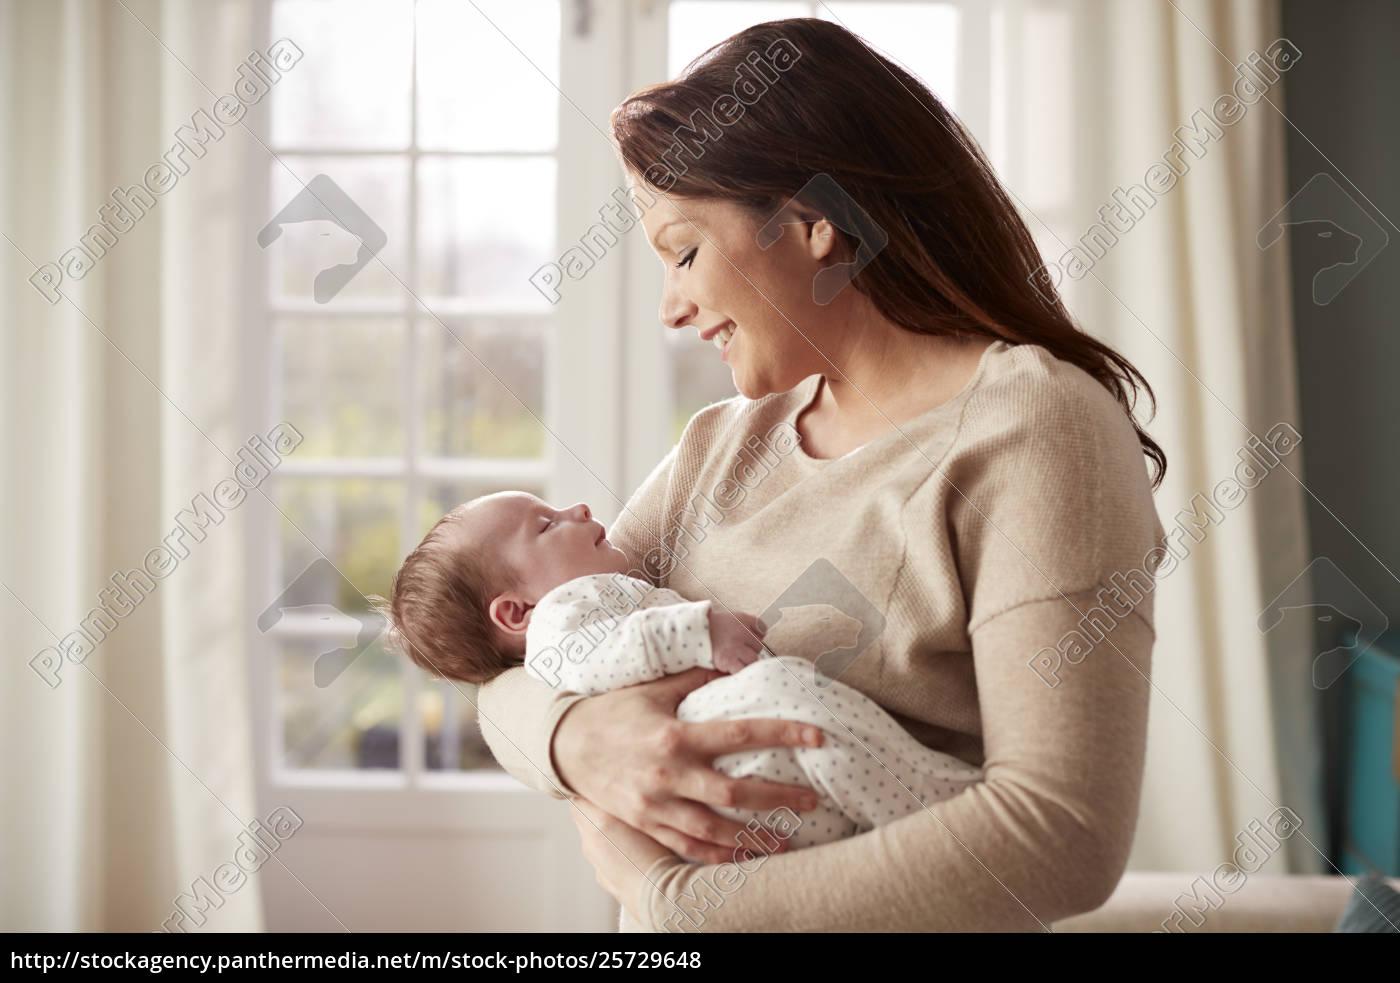 Royalty free photo 25729648 loving mother cuddling newborn baby at home